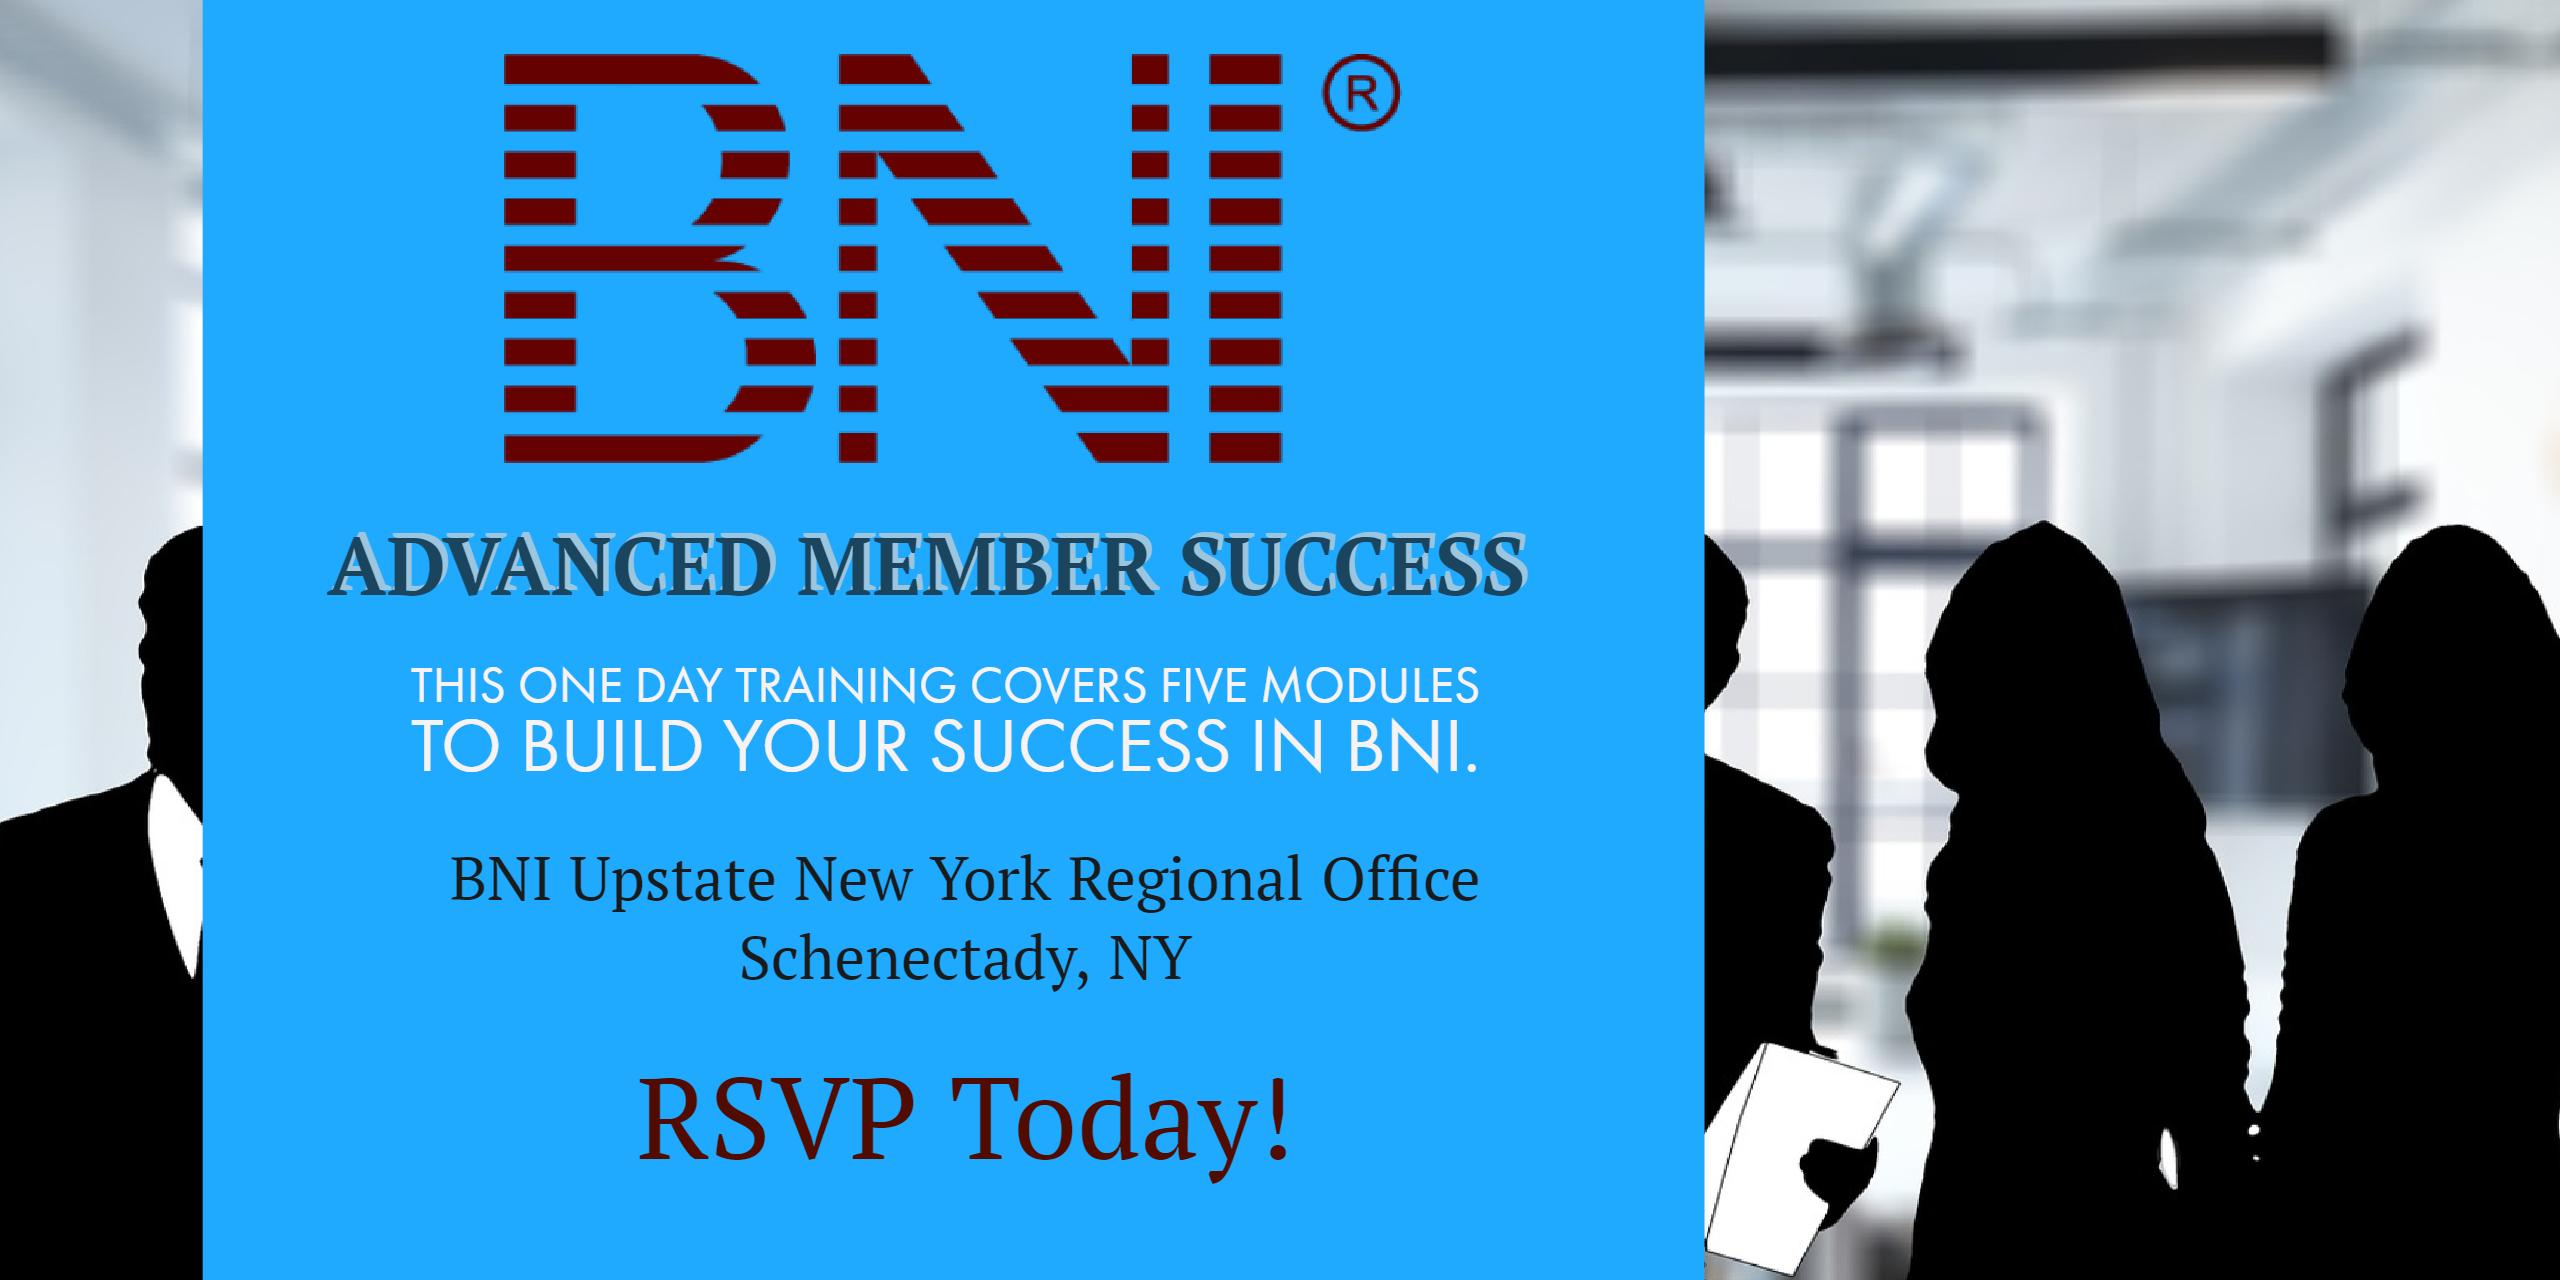 Advanced Member Success Program